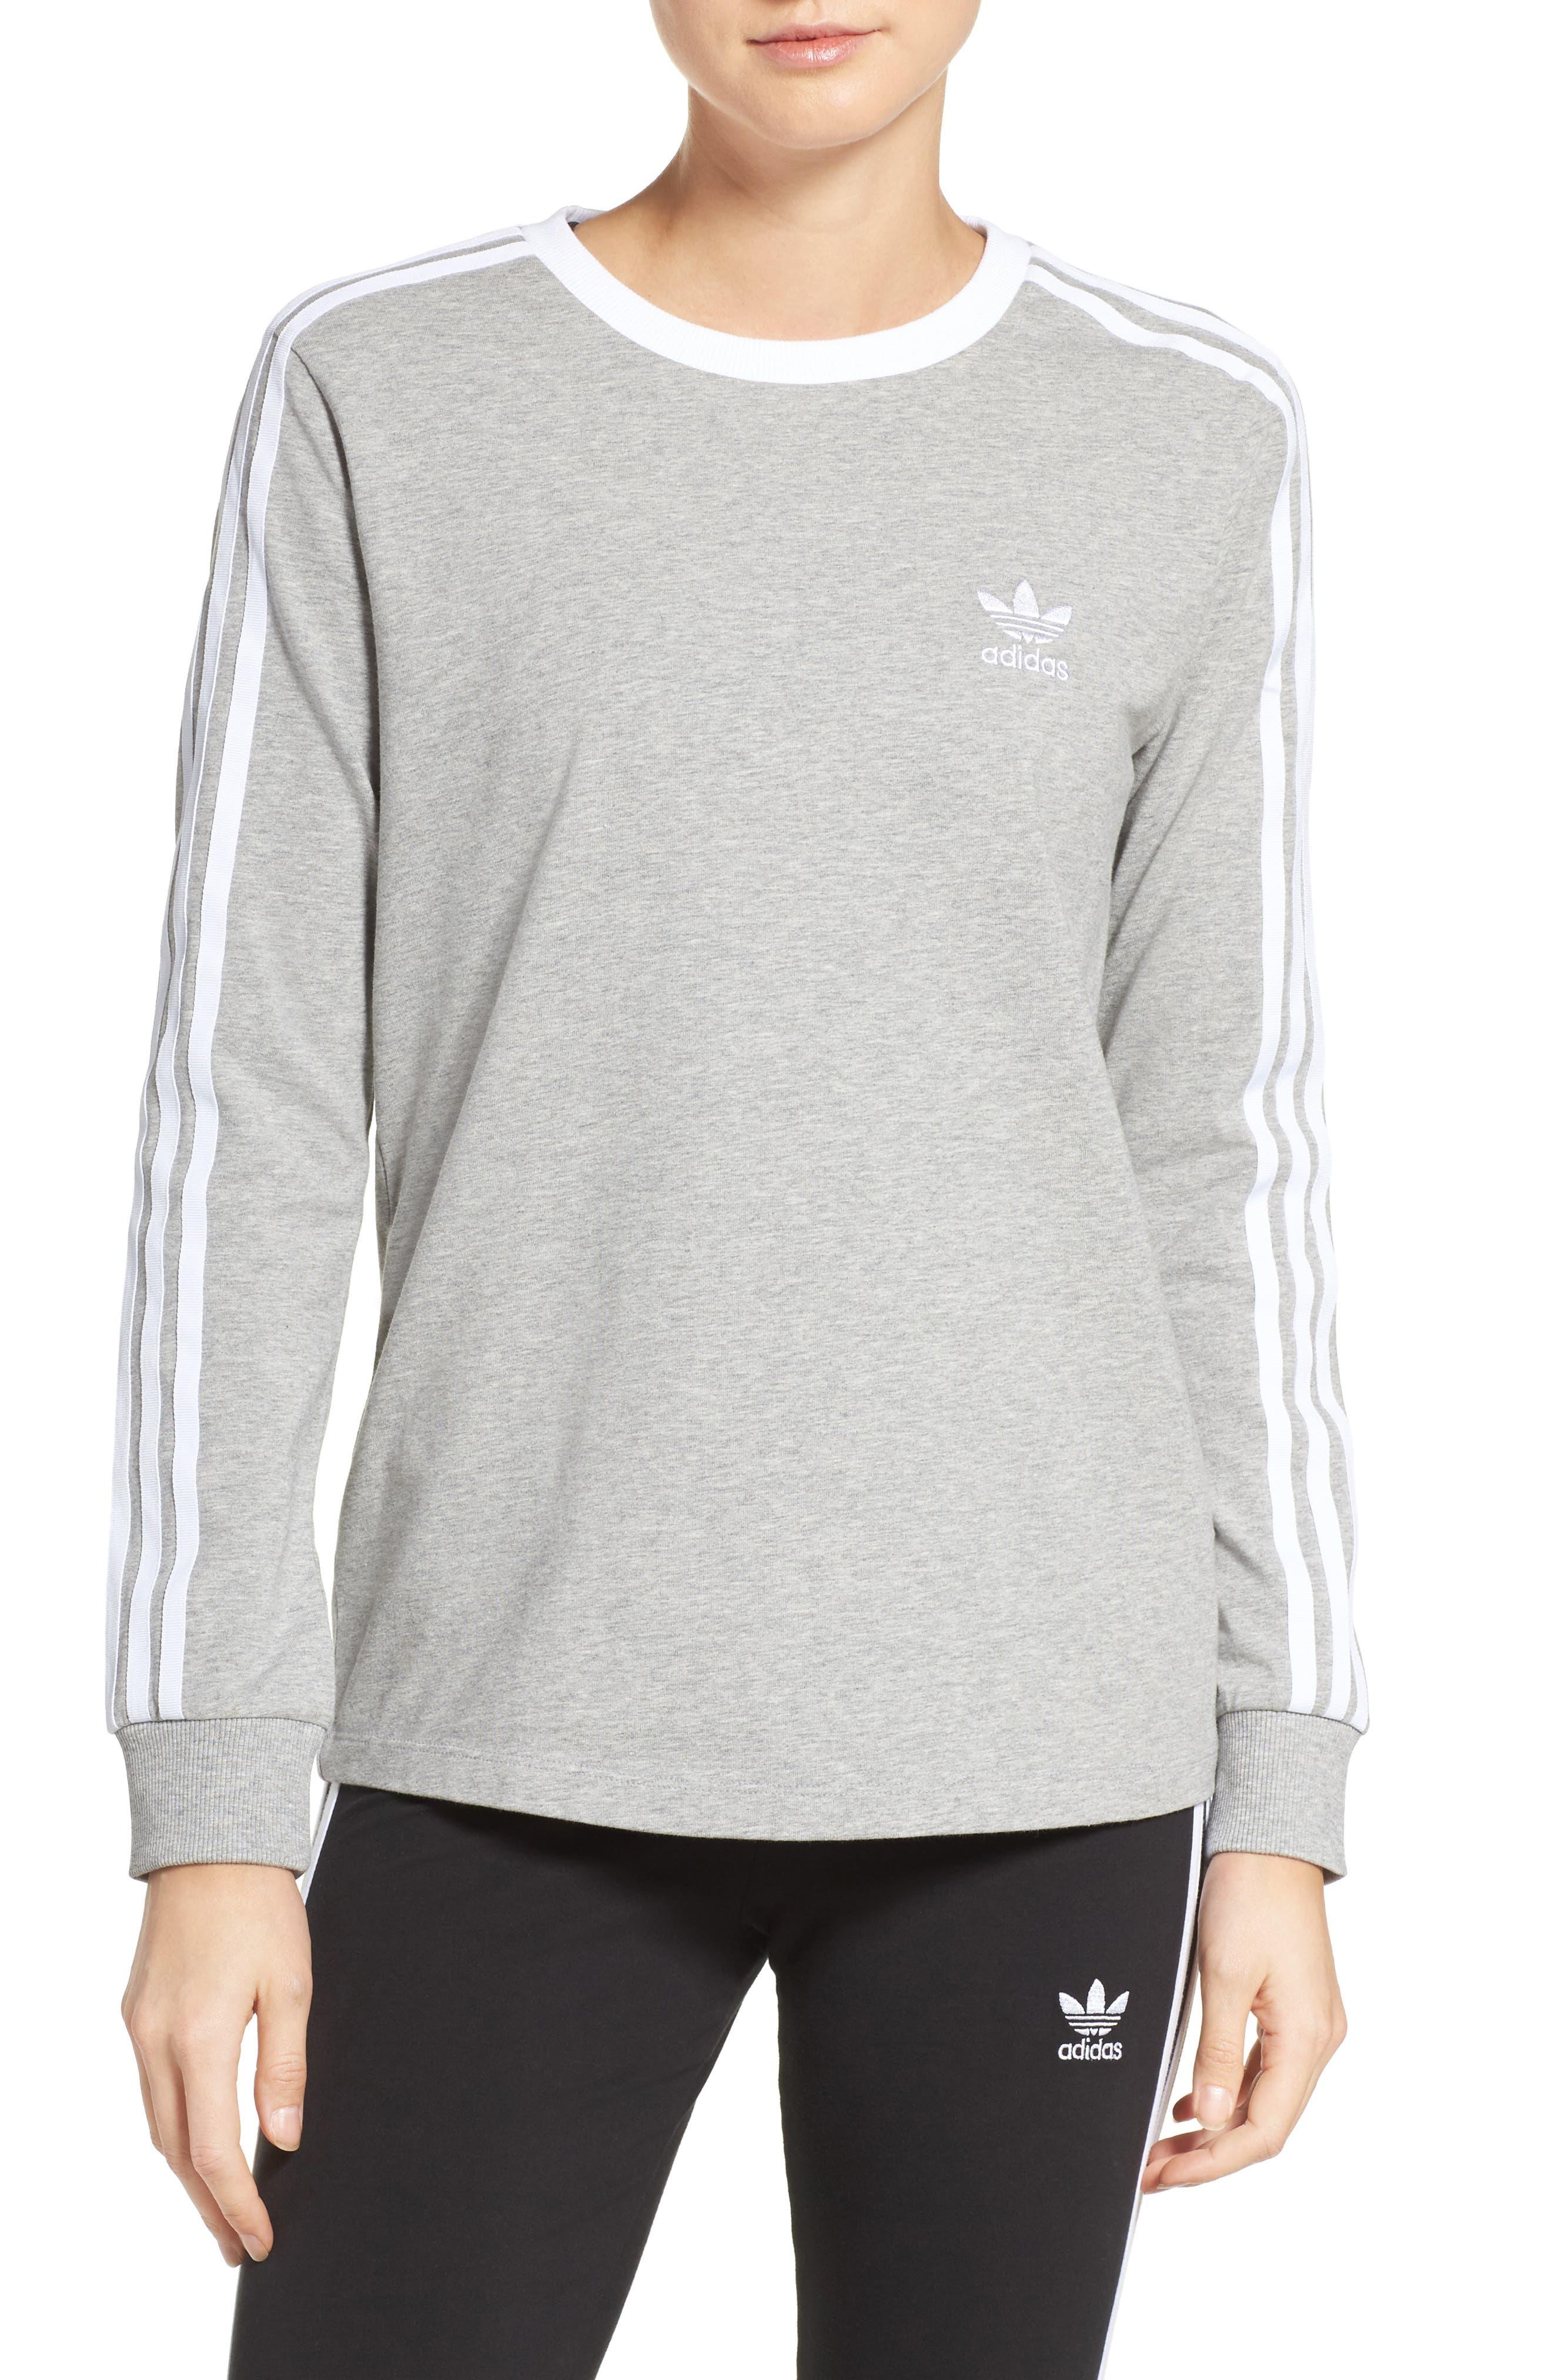 Main Image - adidas Originals Jersey Tee